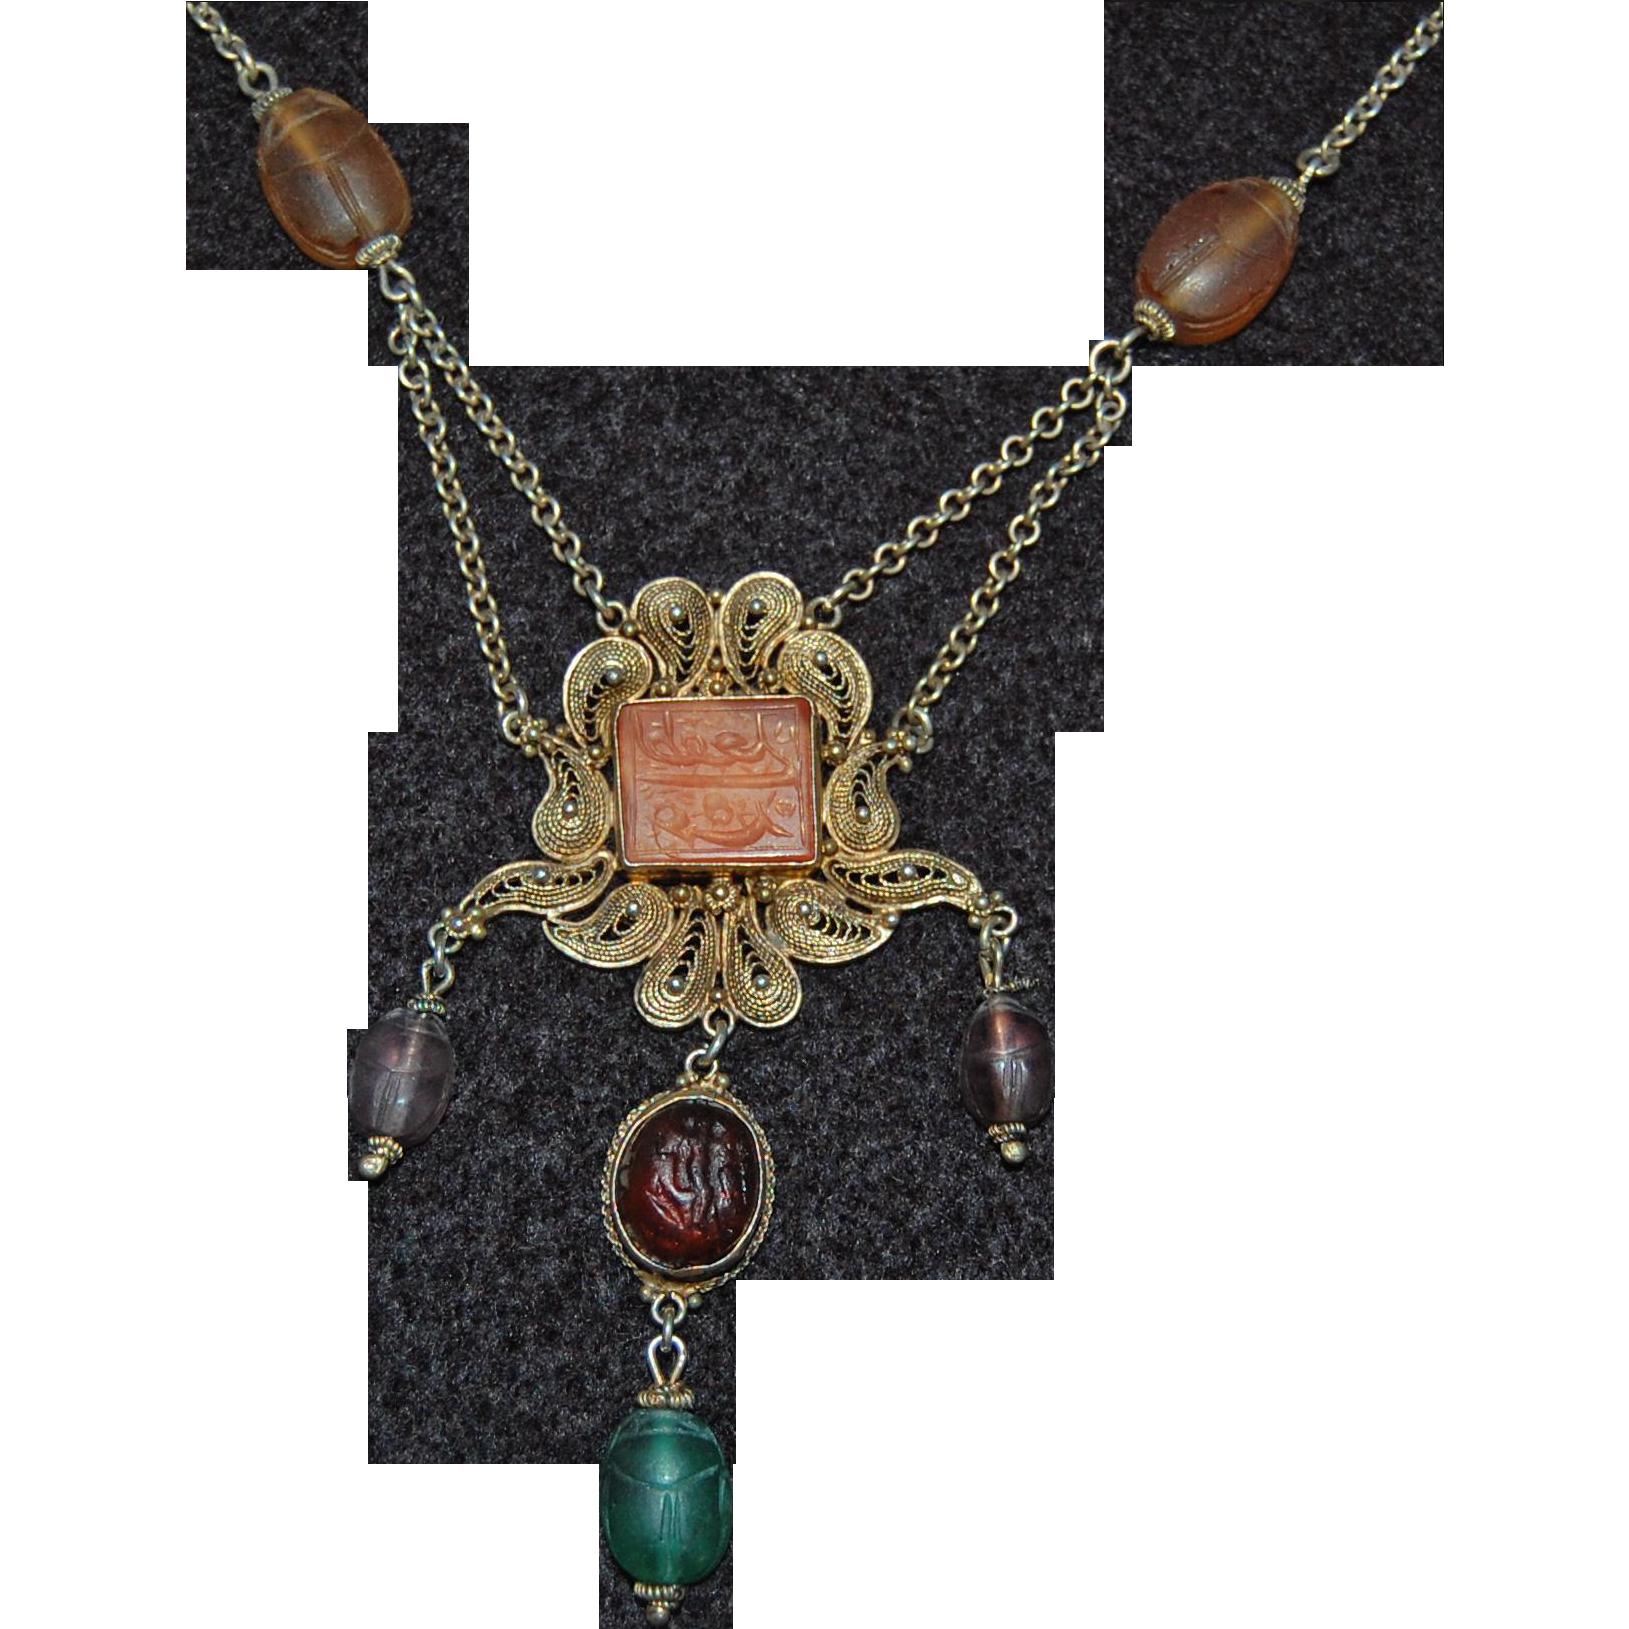 antique SCARAB FESTOON NECKLACE - Arabic Carved Medallion center, c1900